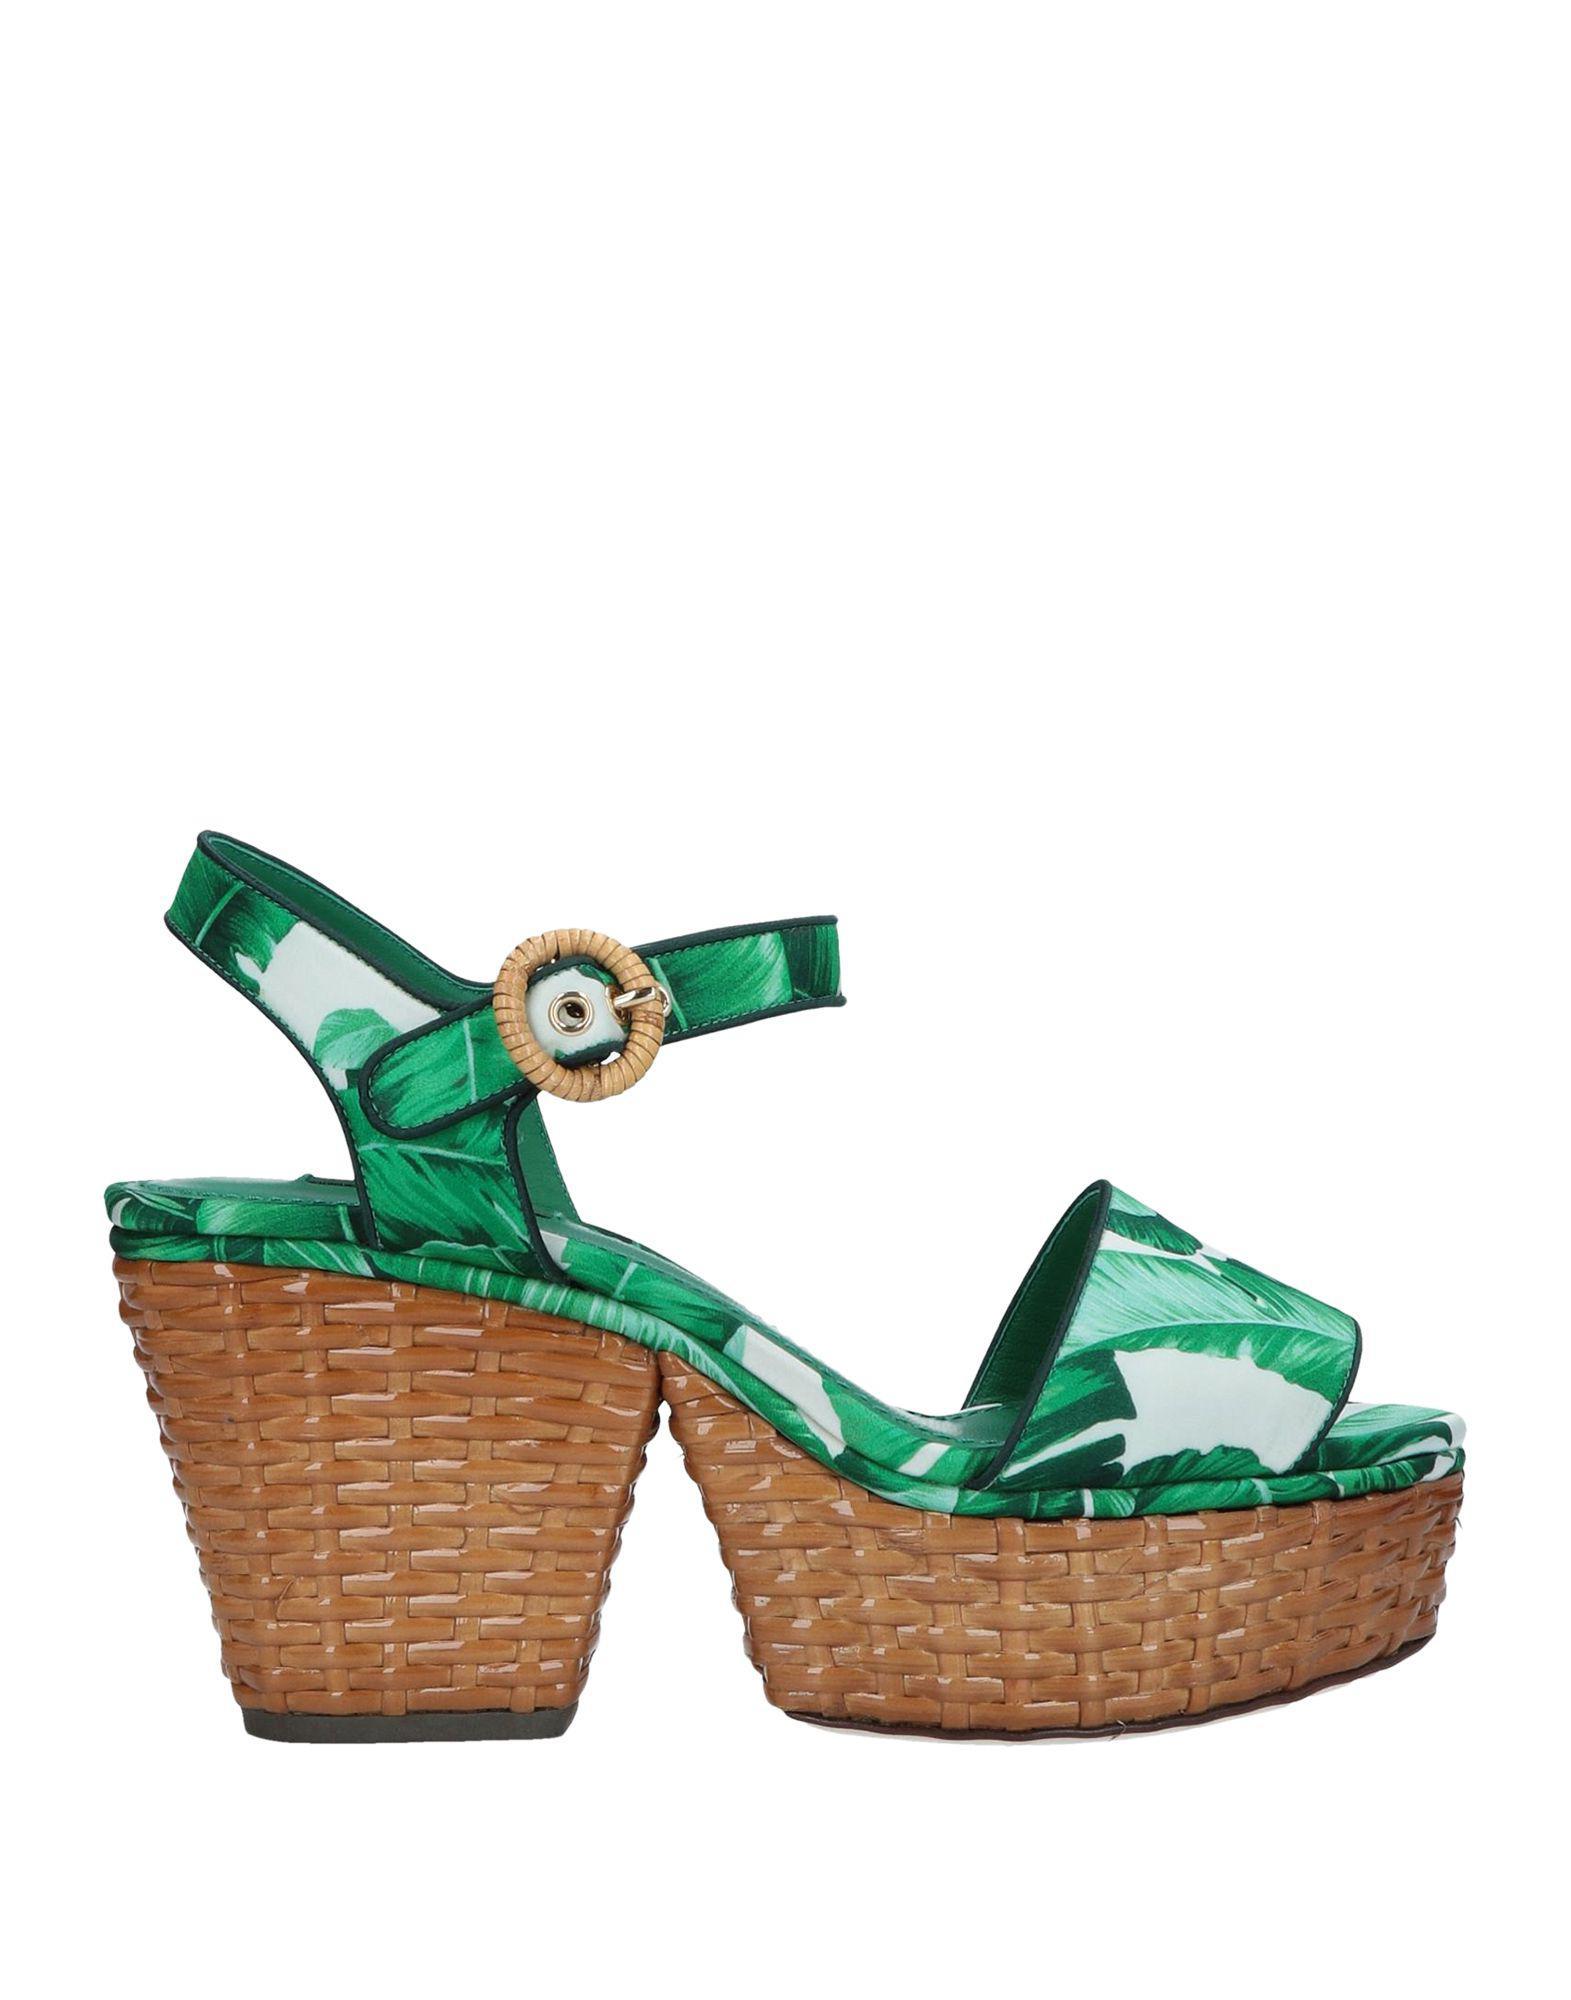 5ff5ffec3c65 Lyst - Dolce   Gabbana Sandals in Green